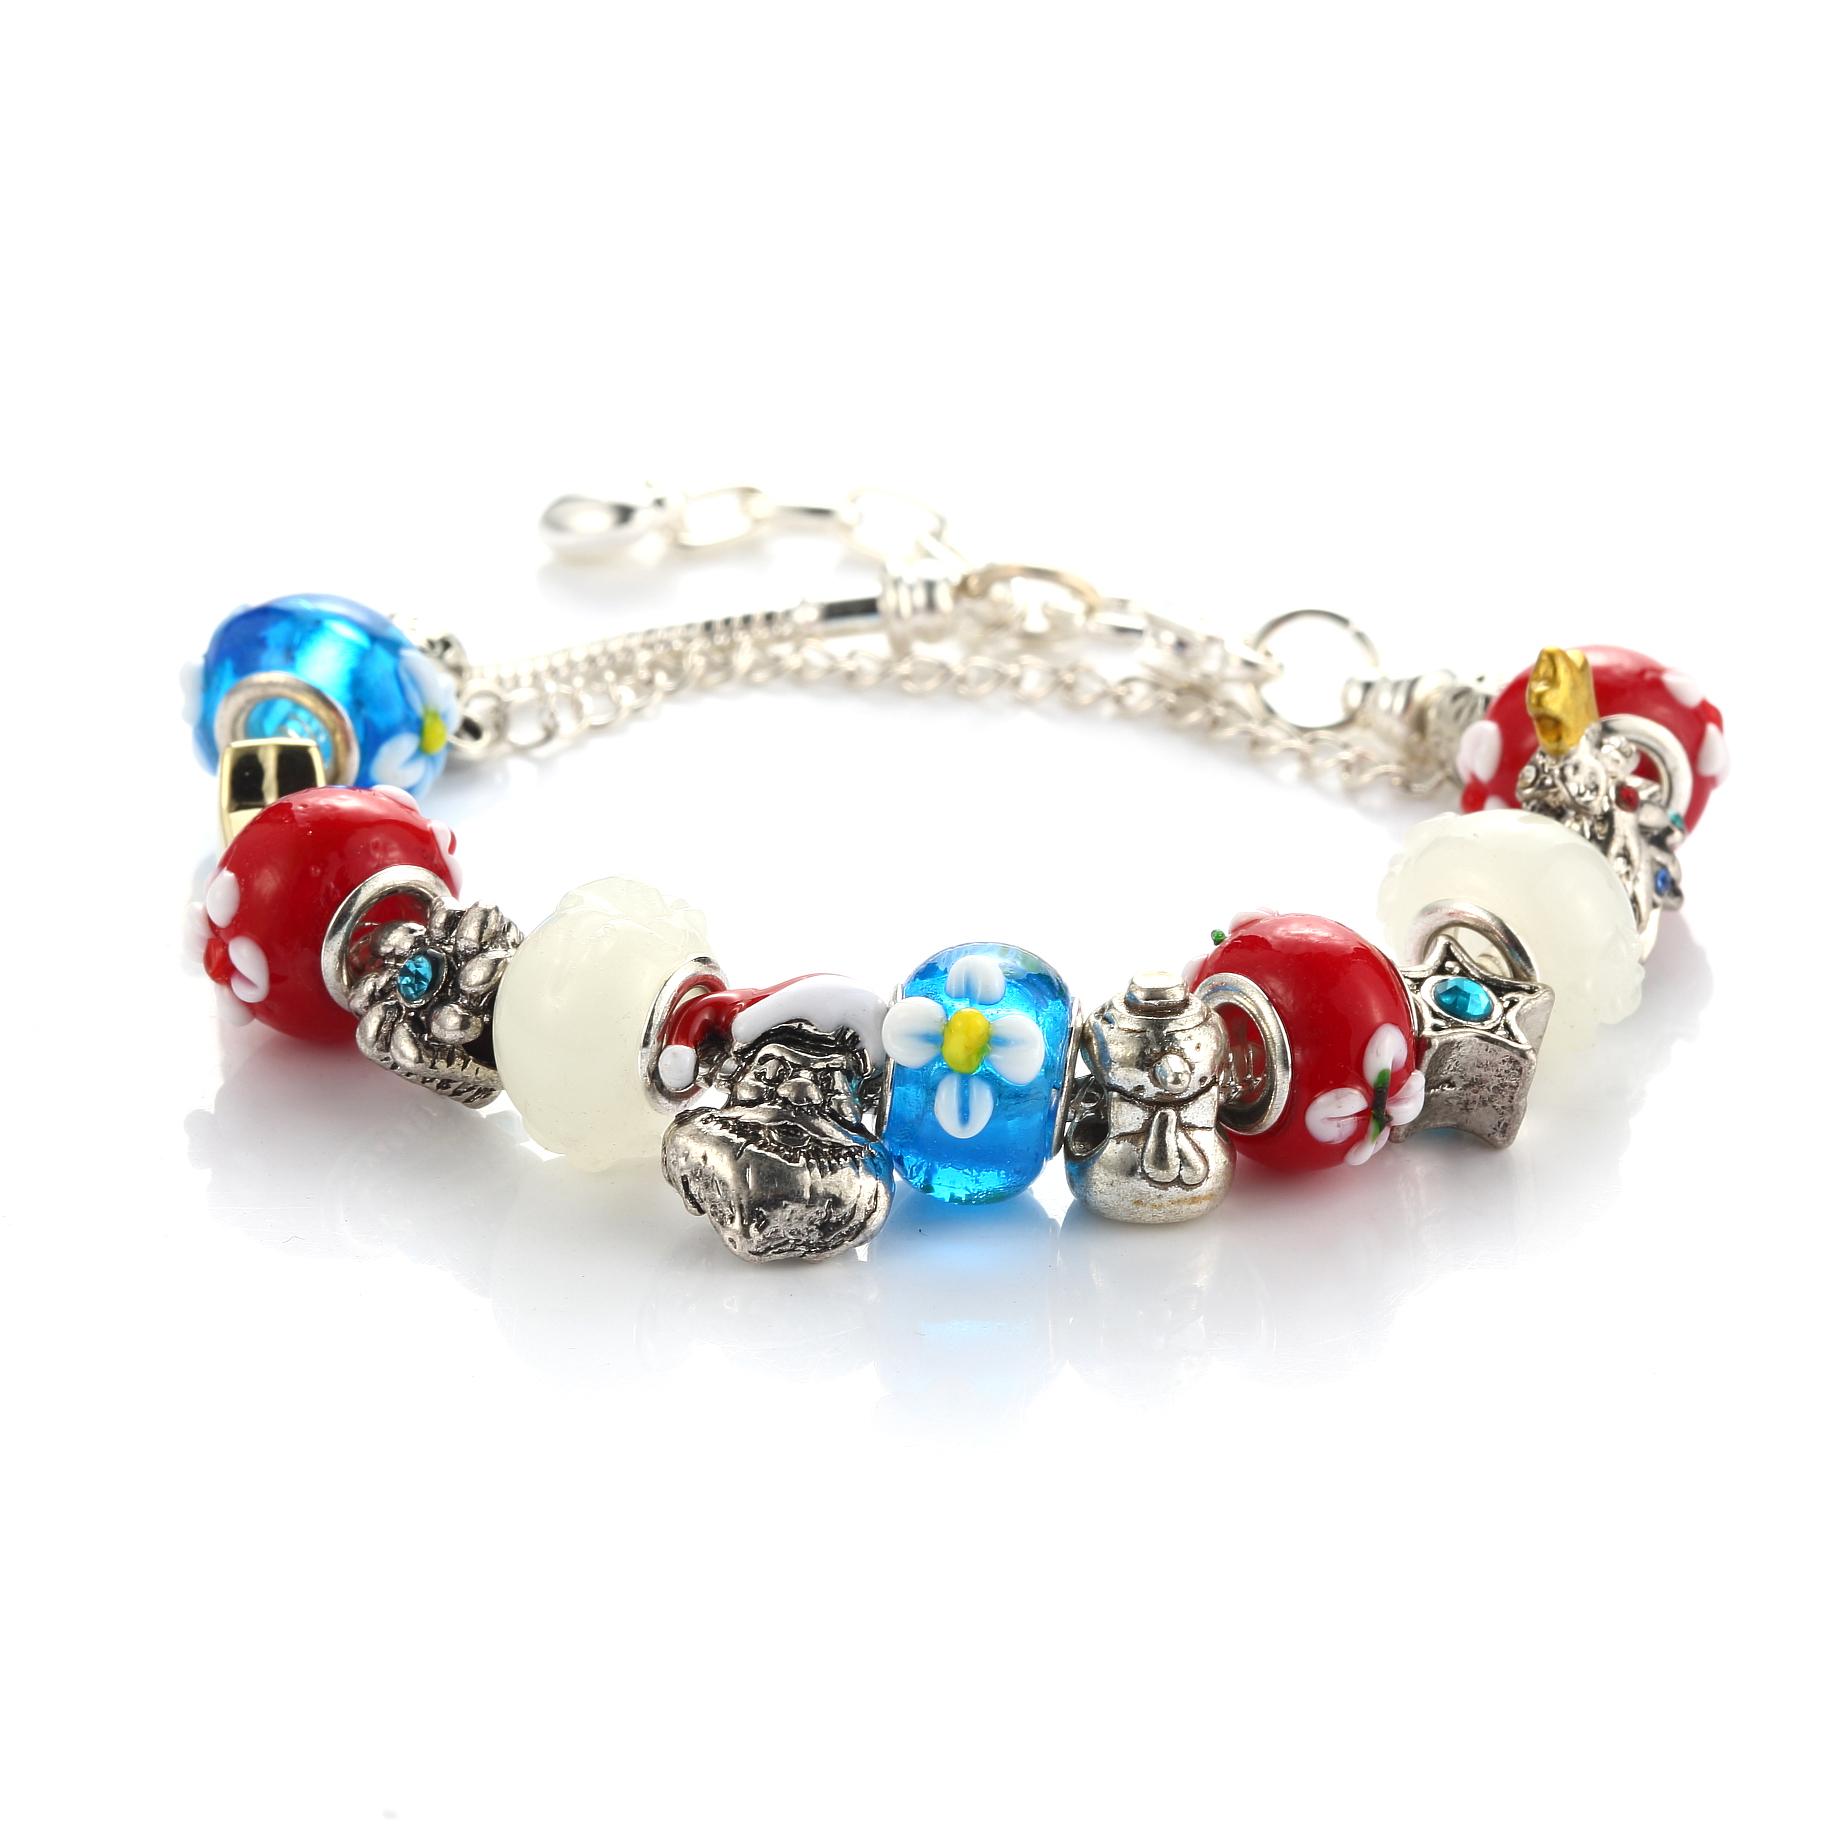 Happy Holidays Festive Charm Bracelet